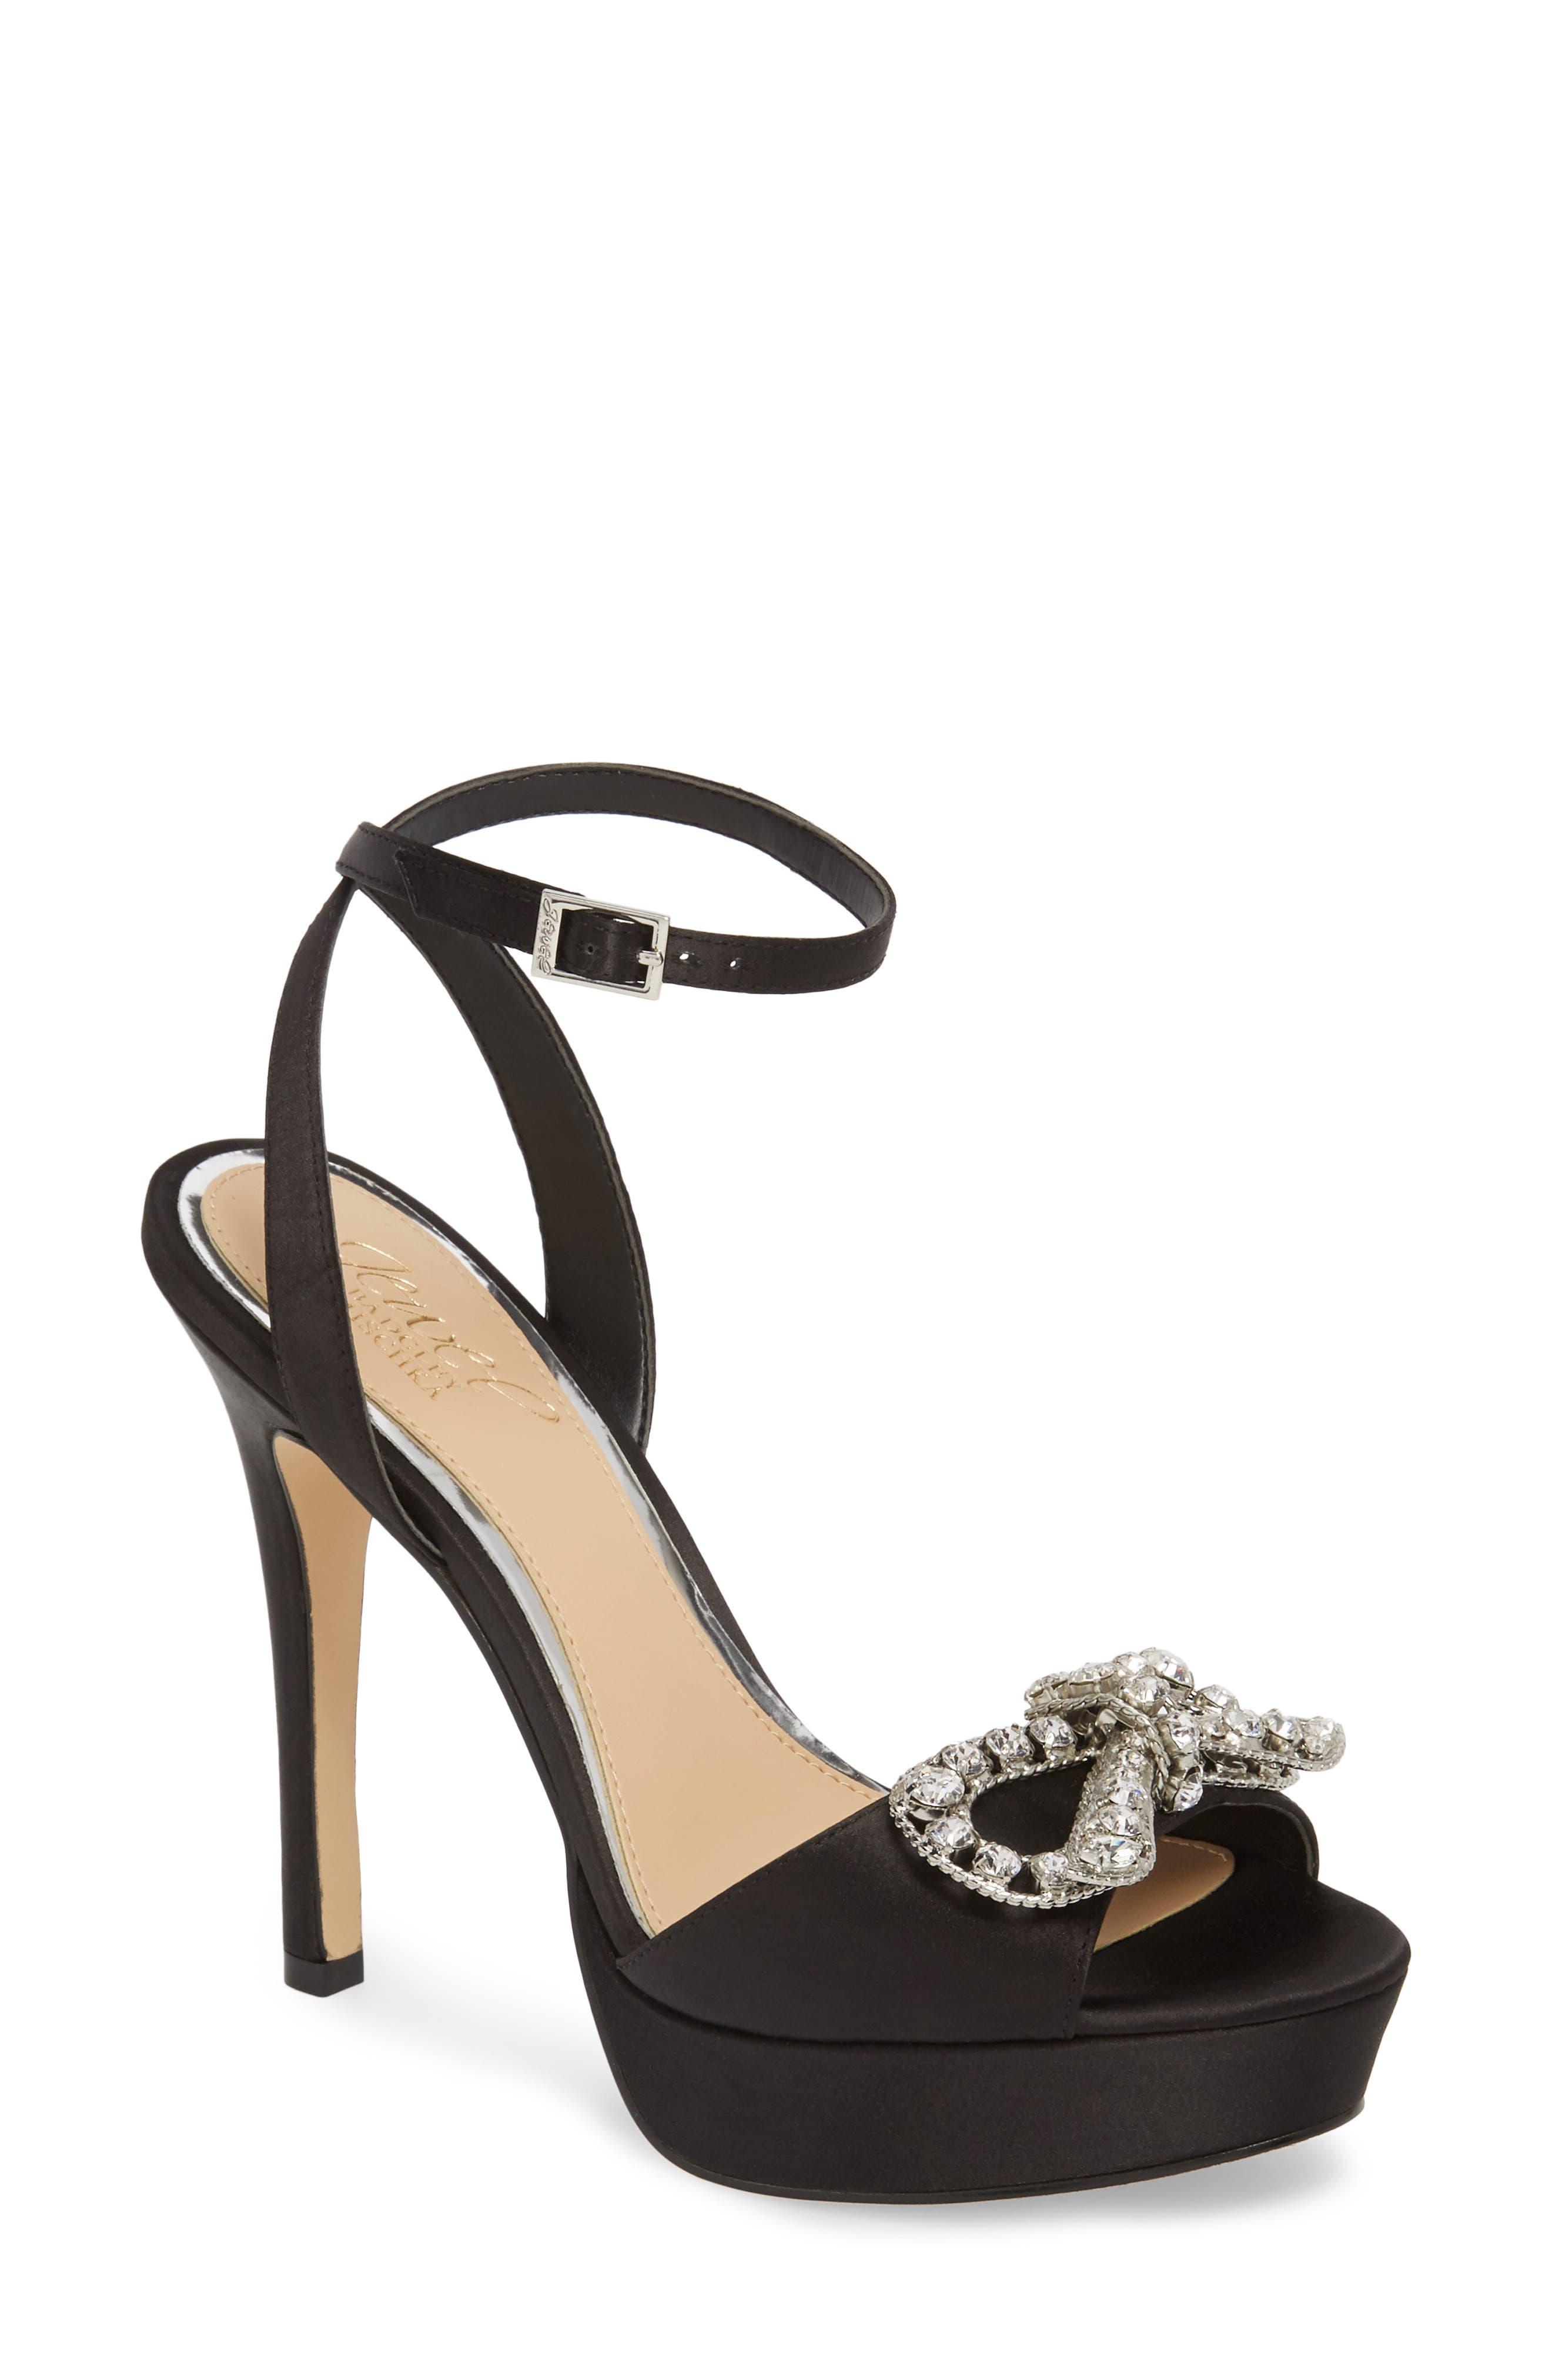 Mildred Crystal Bow Platform Sandal,                             Main thumbnail 1, color,                             BLACK SATIN